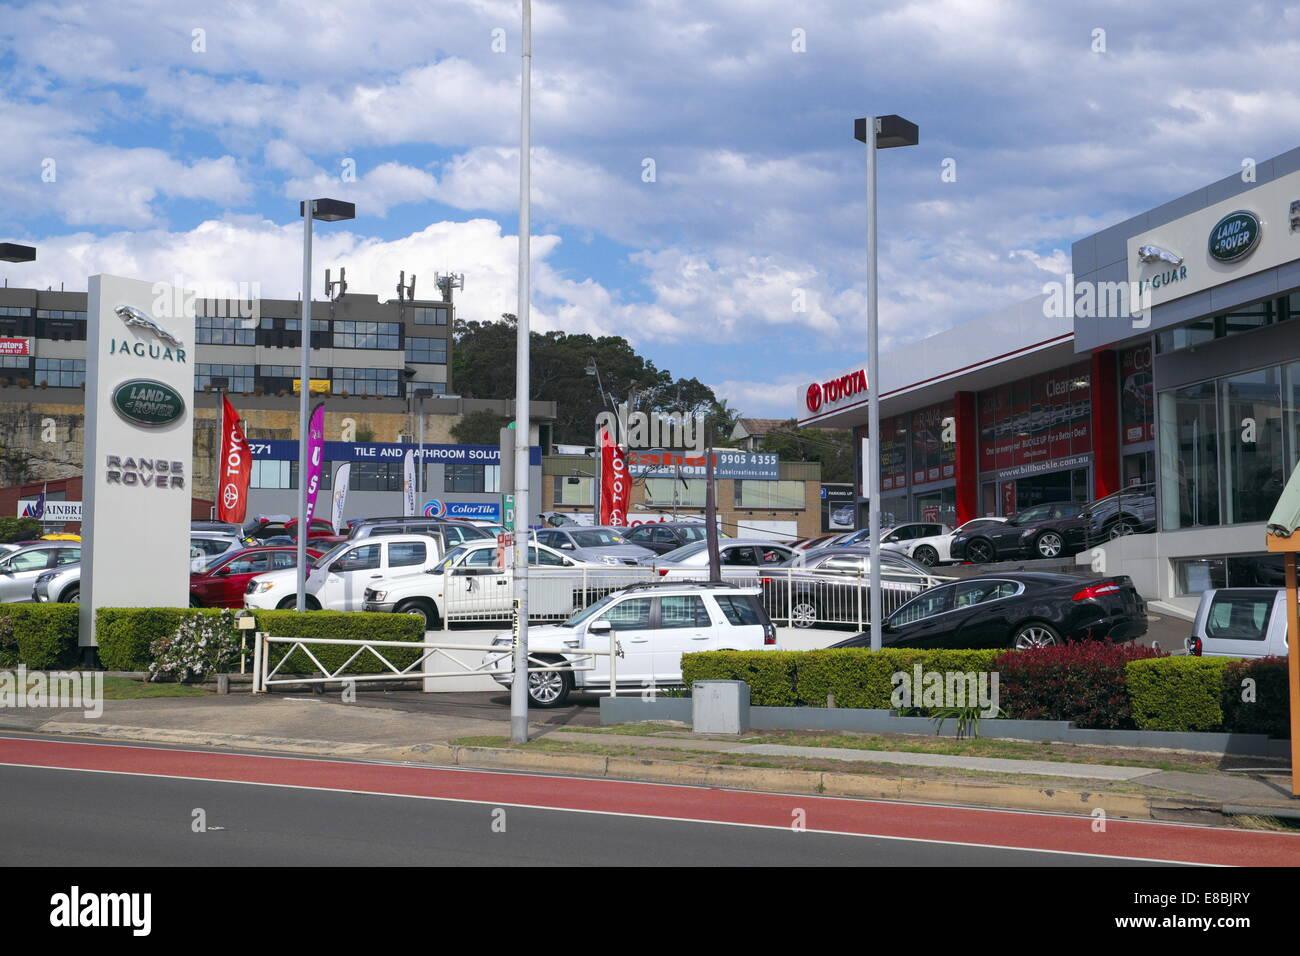 used car dealers sydney toyota - photo#29